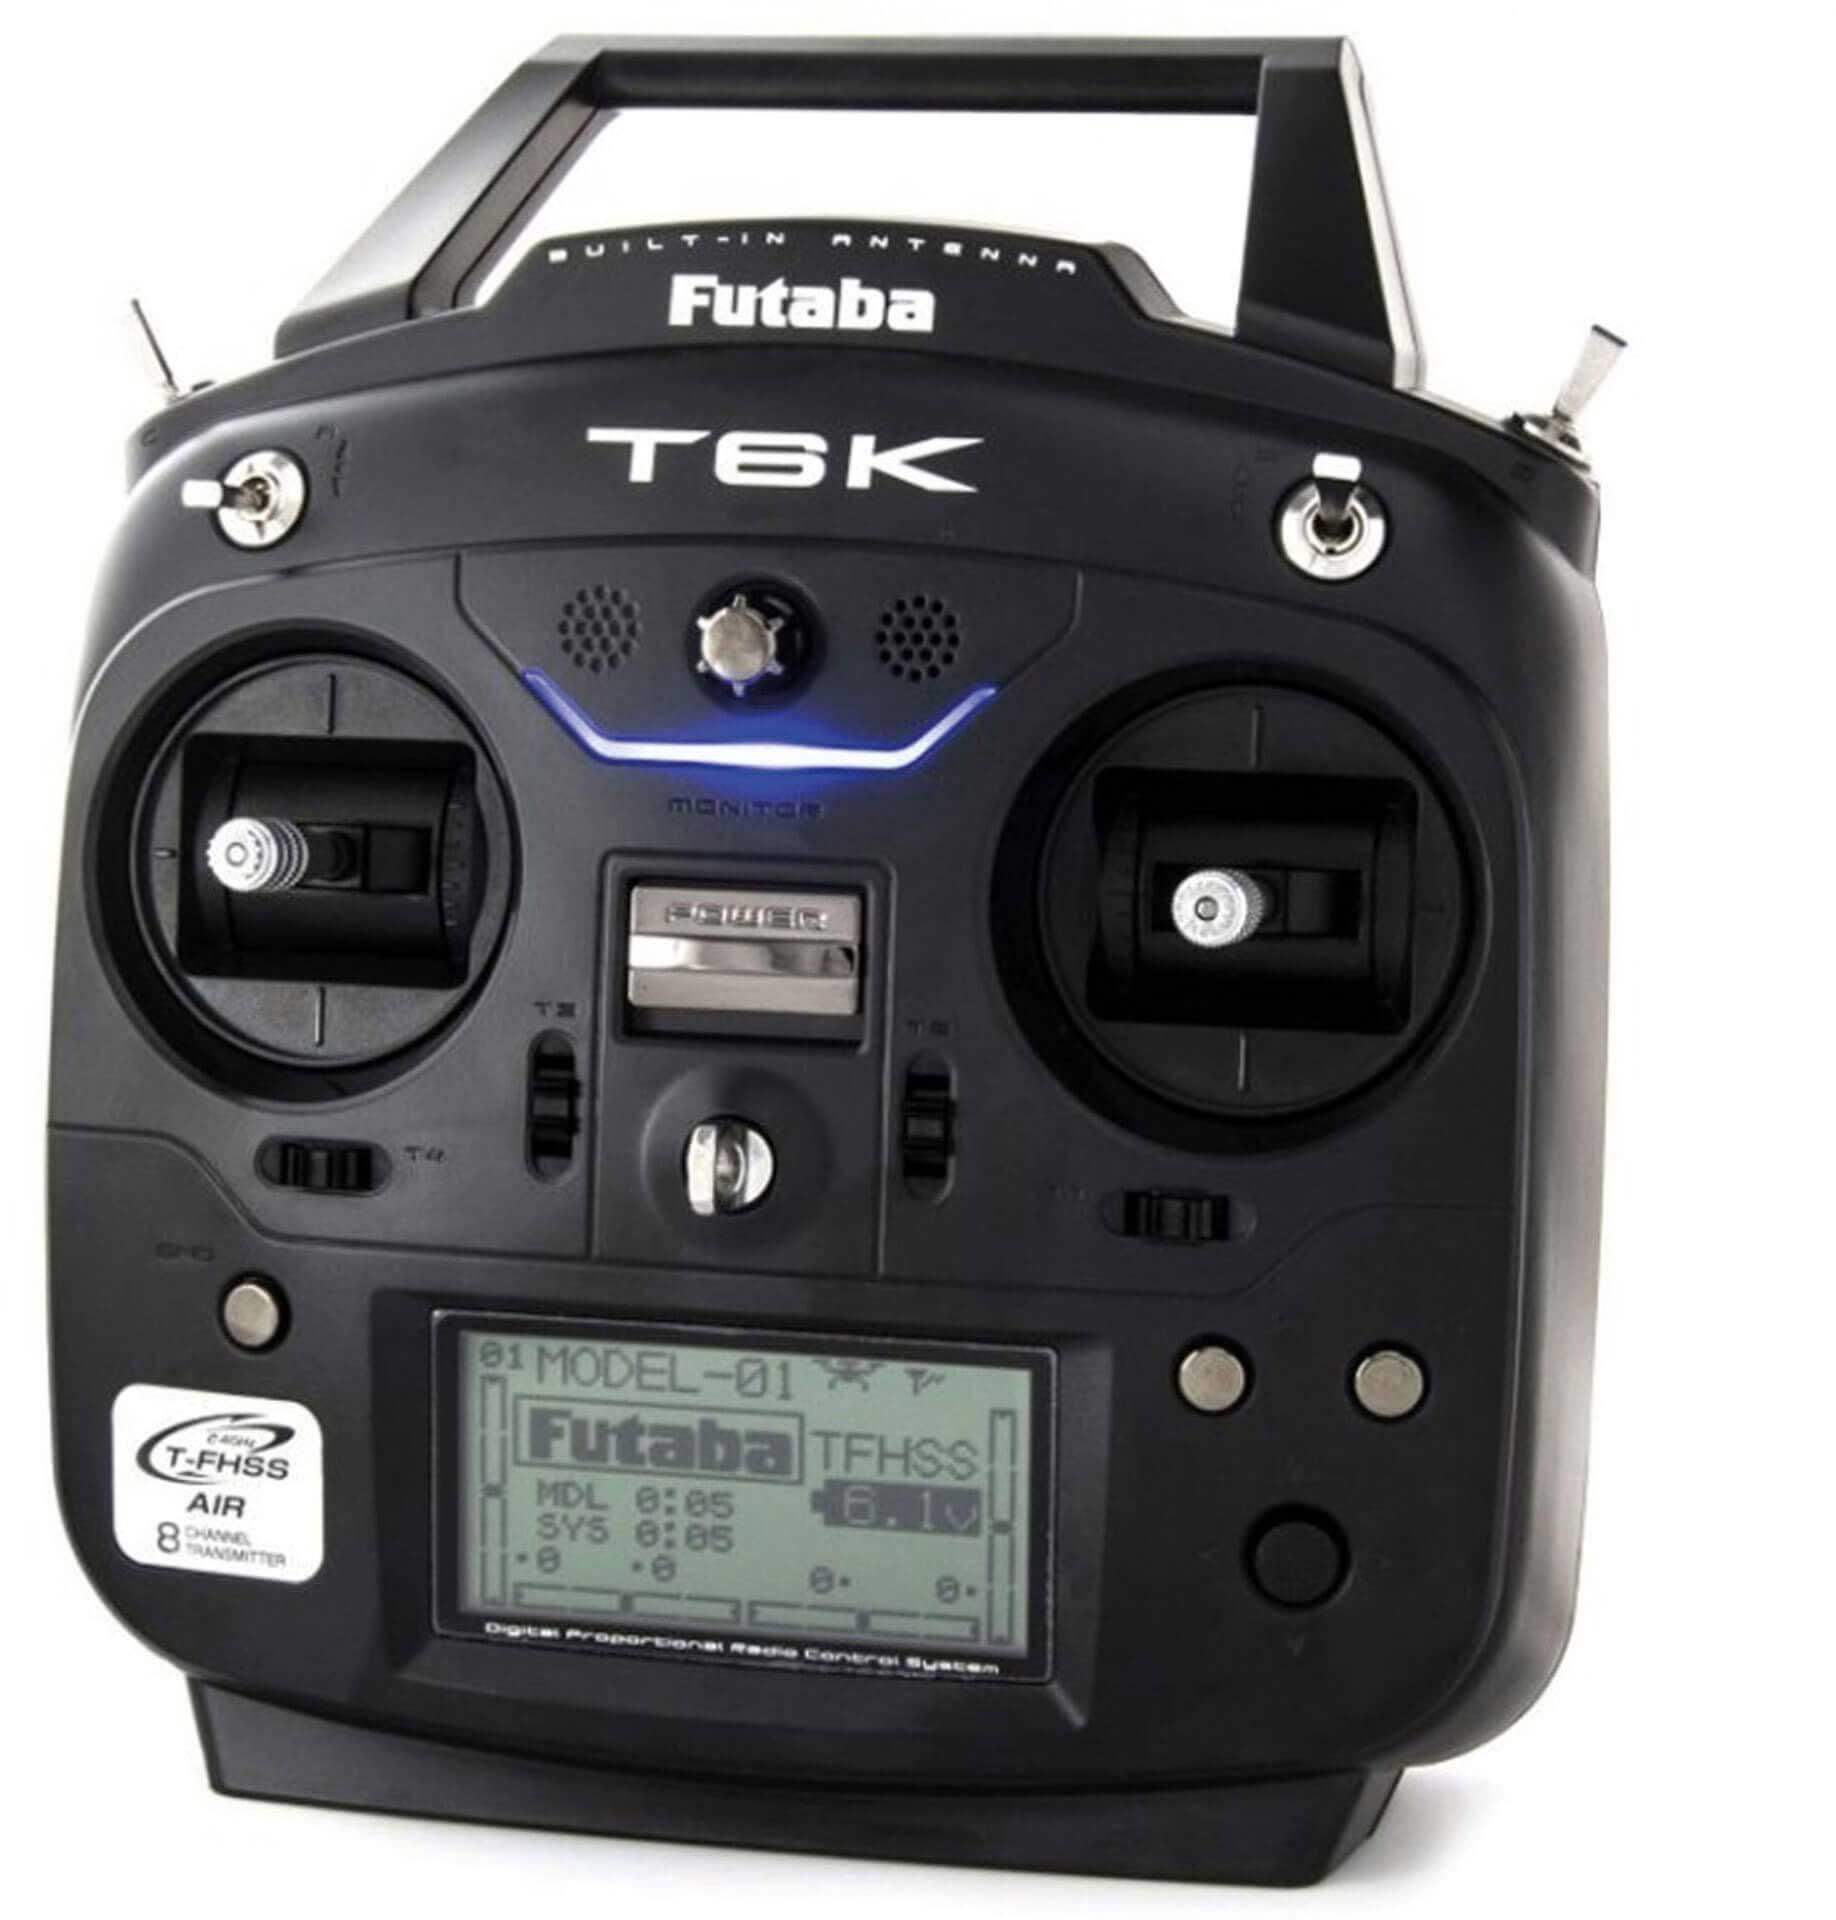 FUTABA T6K V2.0 T-FHSS Mode 2 mit R3006SB, Lipo und Ladegerät